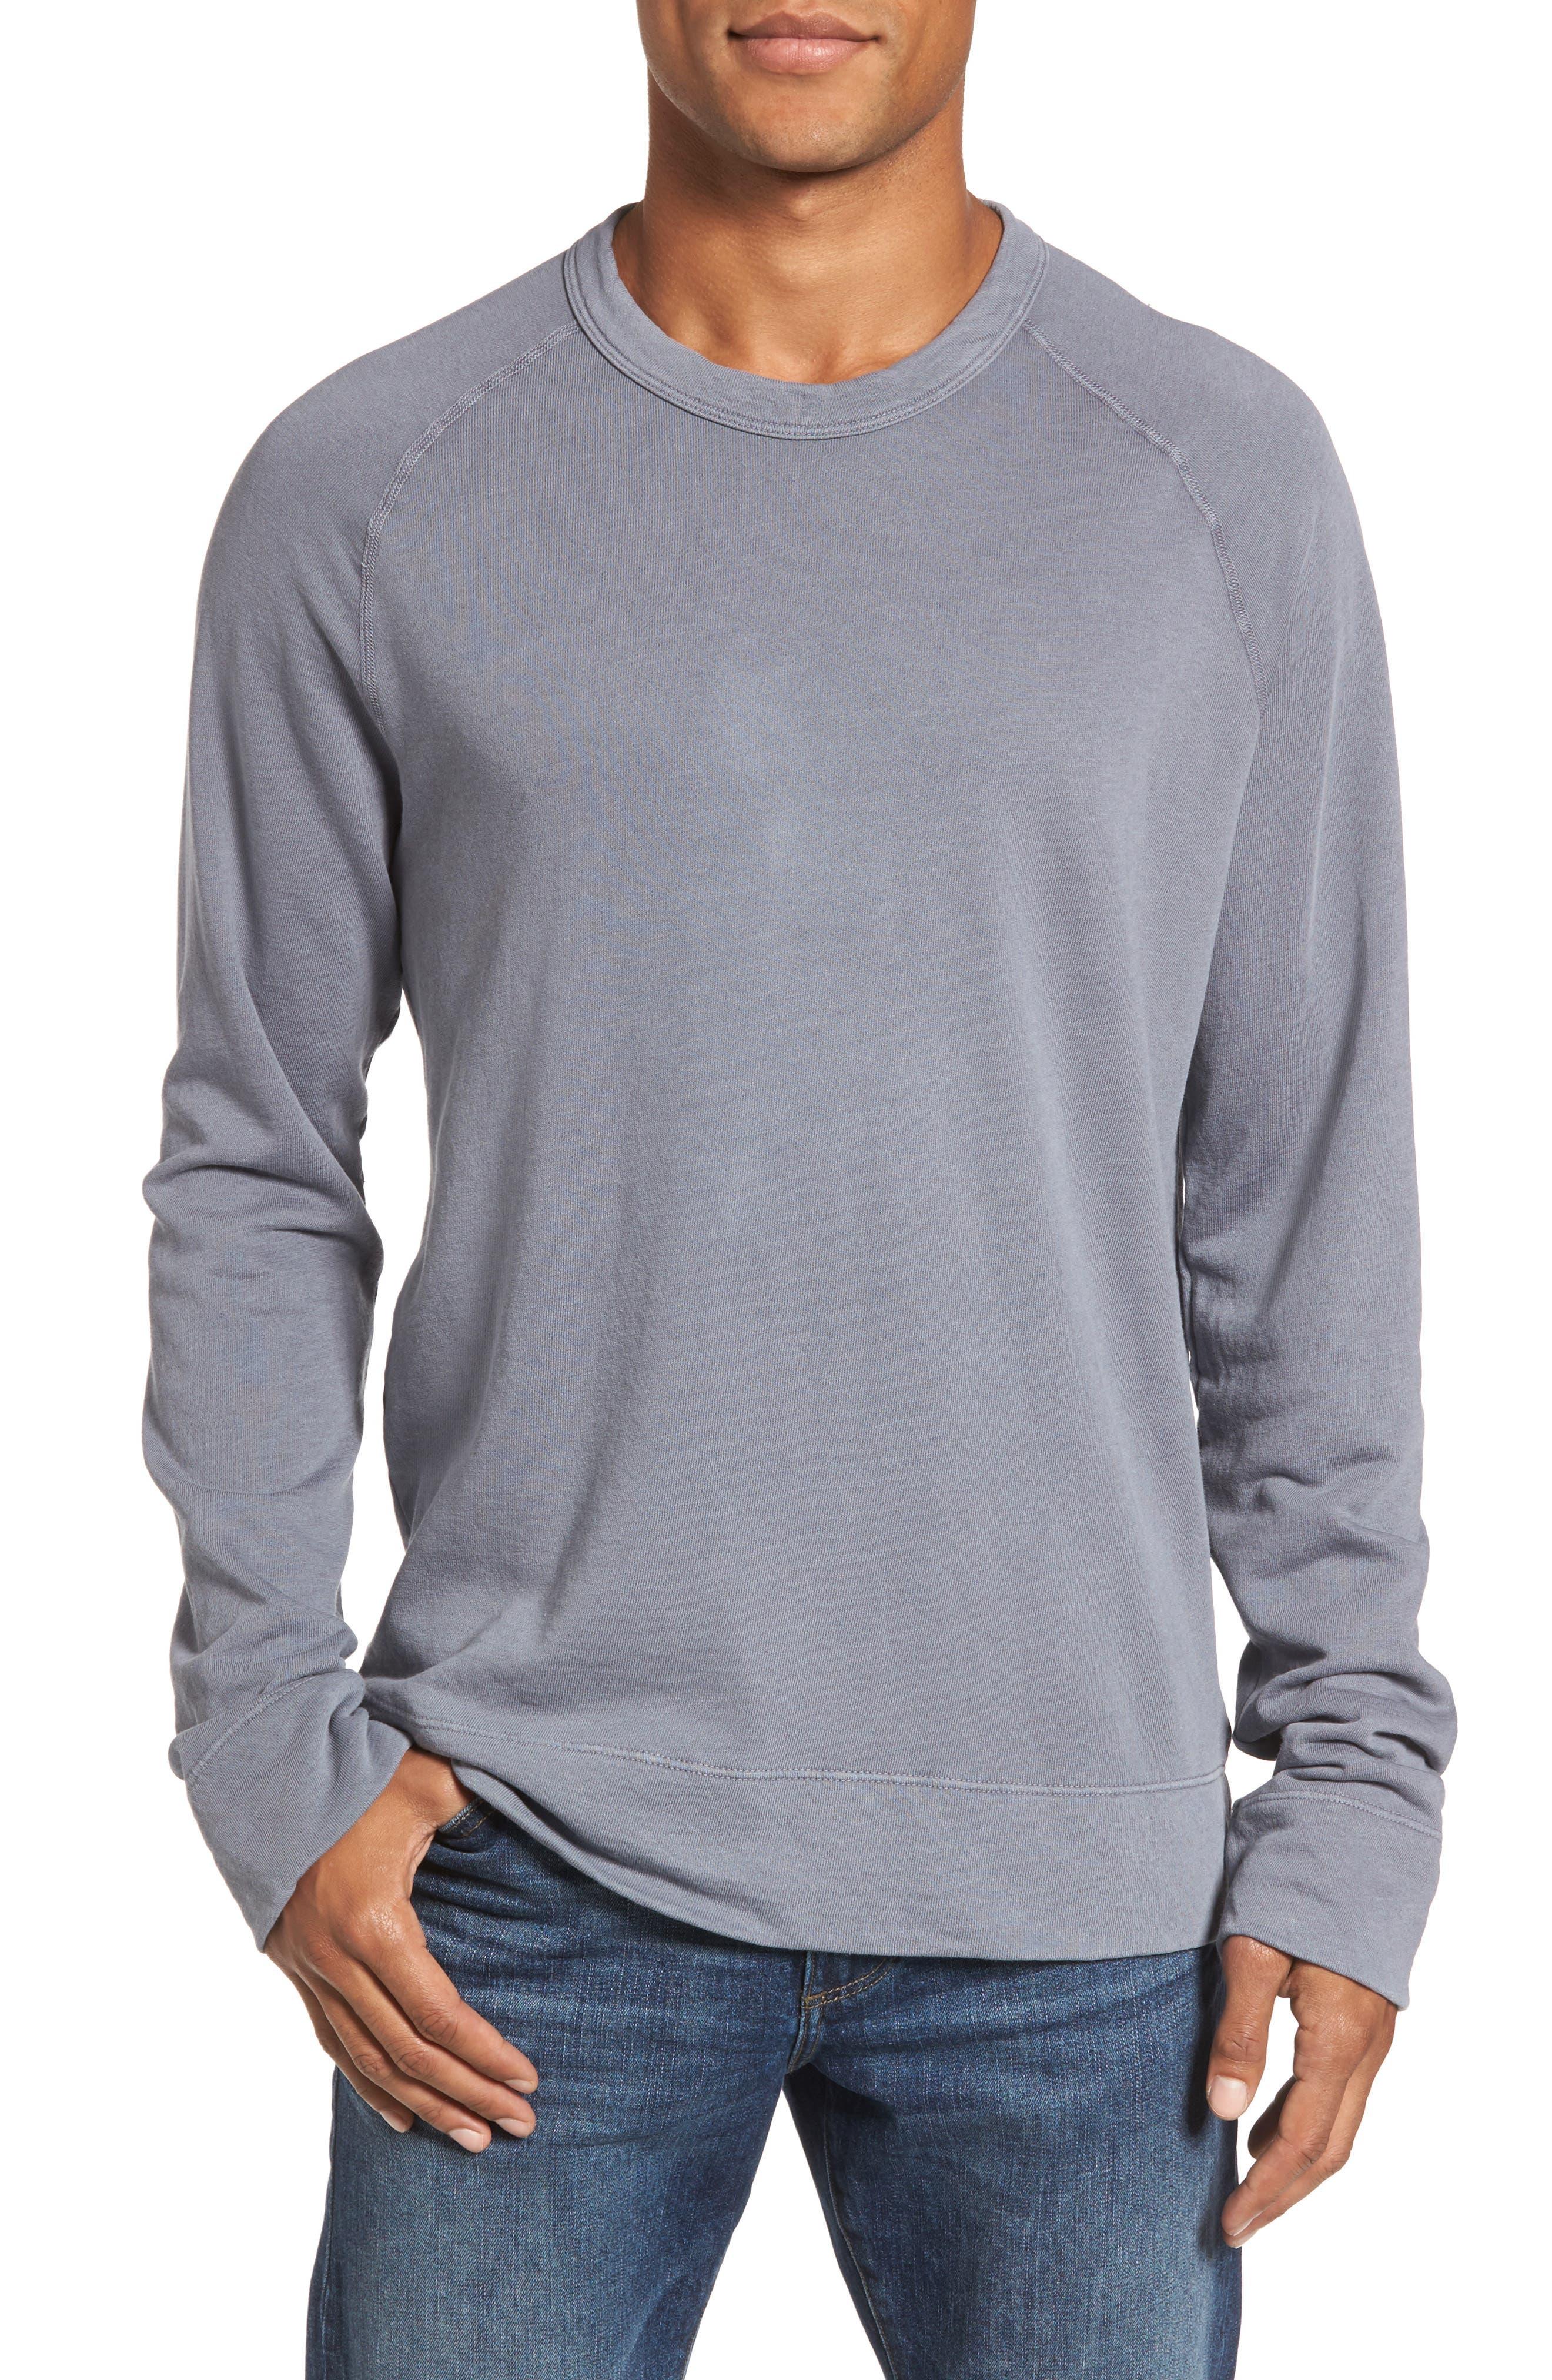 Raglan Crewneck Sweatshirt,                             Main thumbnail 1, color,                             029